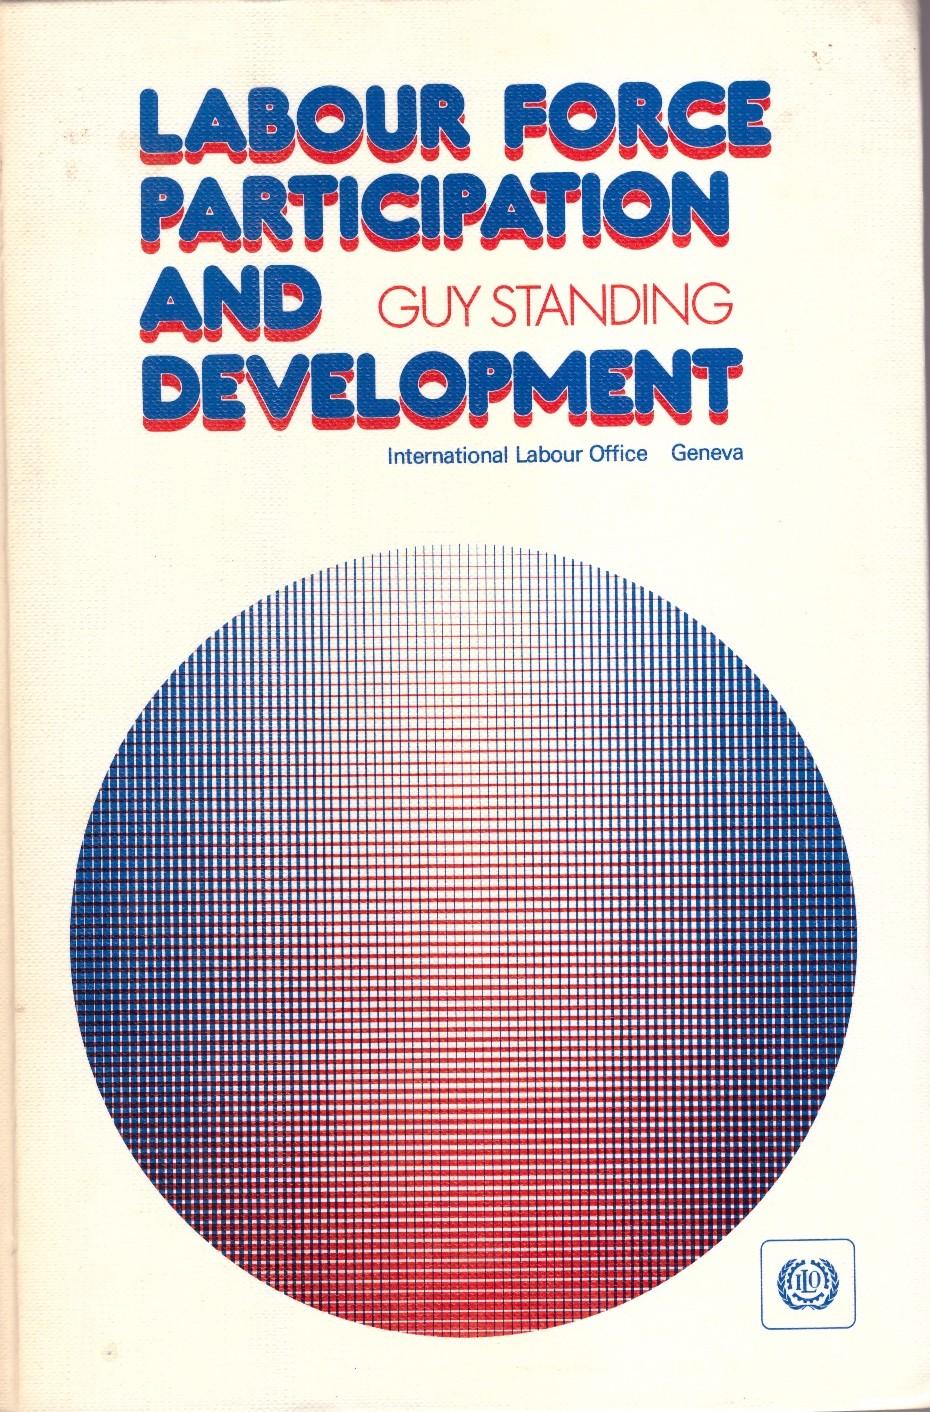 Labour Force Participation and Development (Geneva:ILO, 1978; 2nd edn., 1981, reprinted 1982).   Details